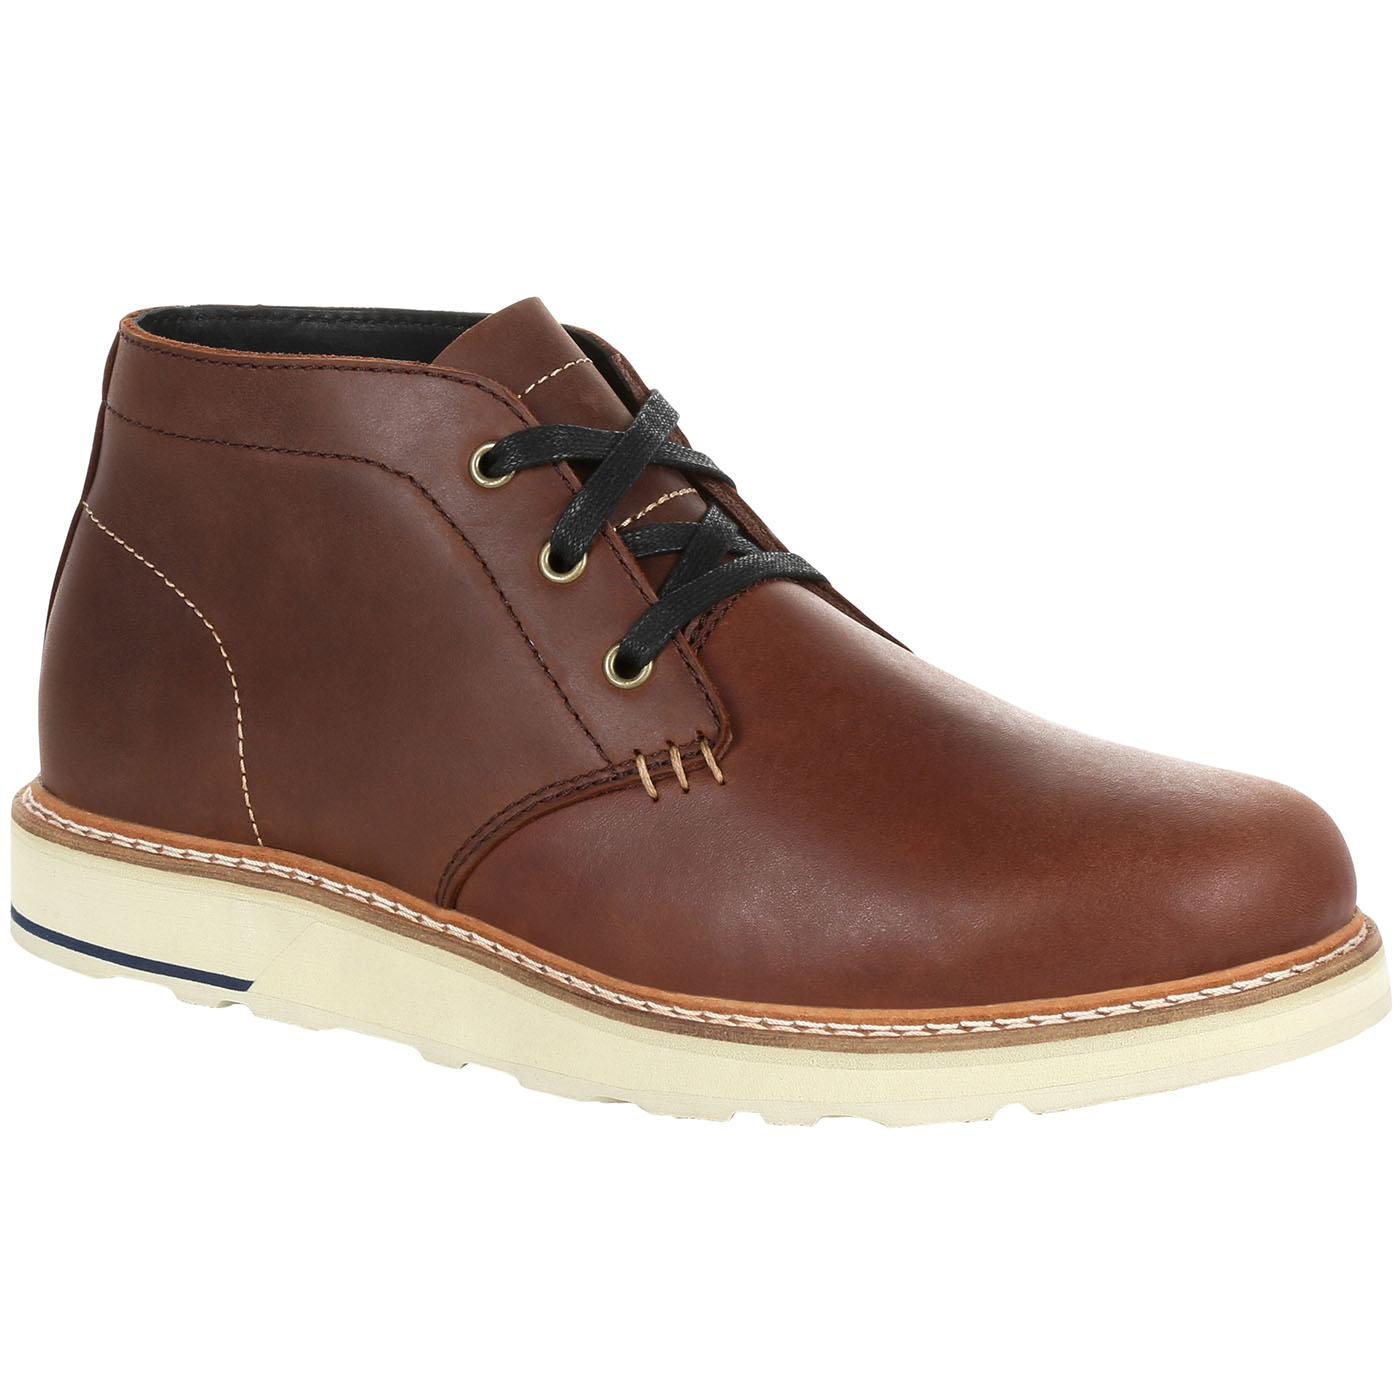 7d0b60e8666 Georgia Boot Small Batch Brown Chukka Boot